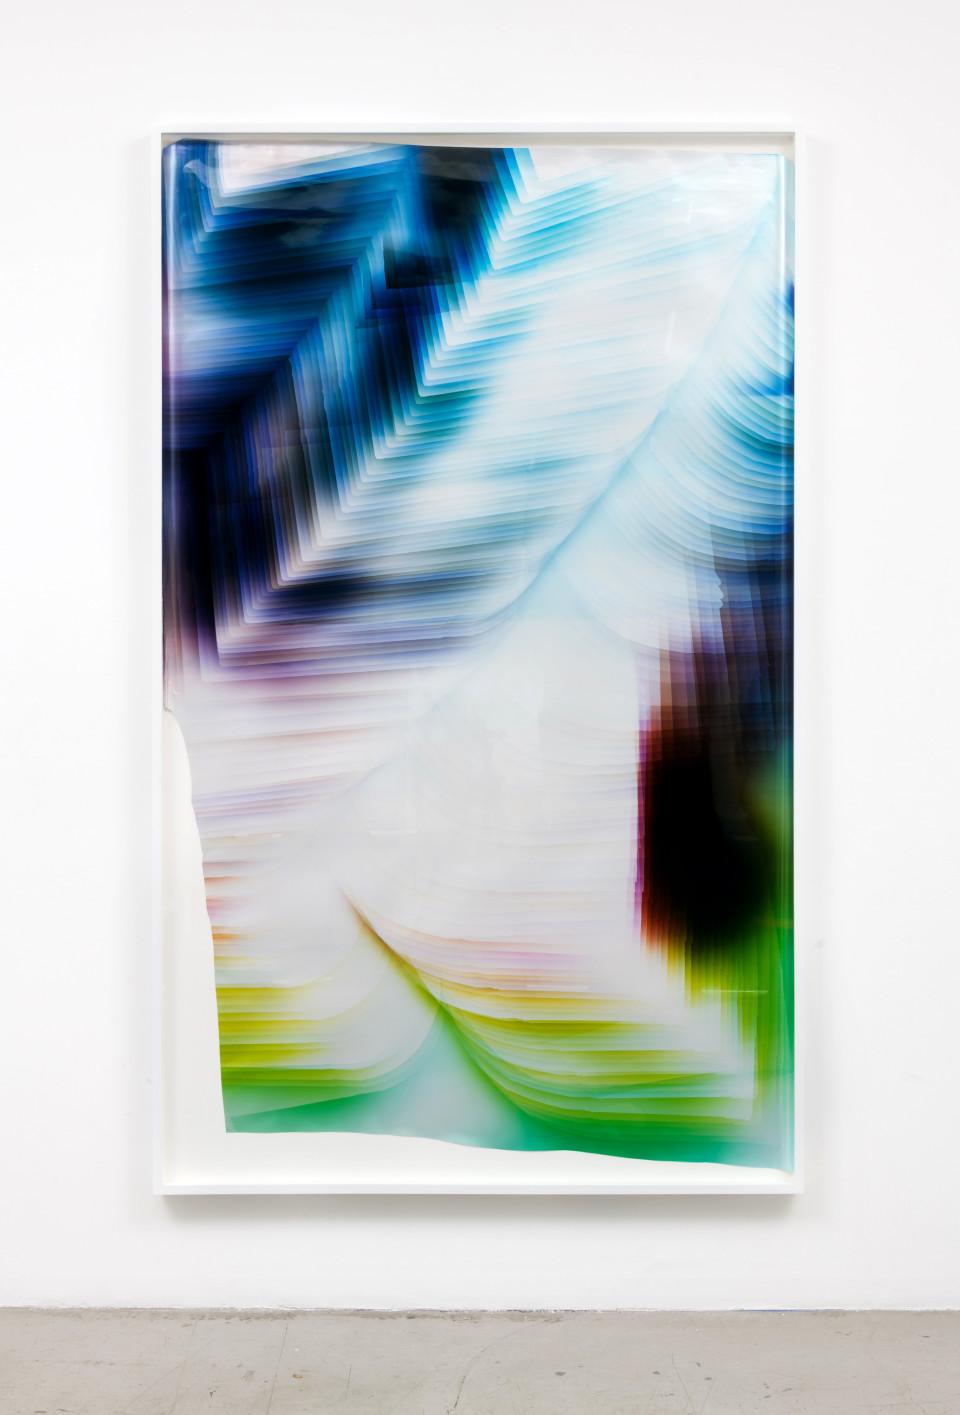 Image: Mariah Robertson  260, 2017  unique chromogenic print  82 x 50 inches (208.3 x 127 cm)